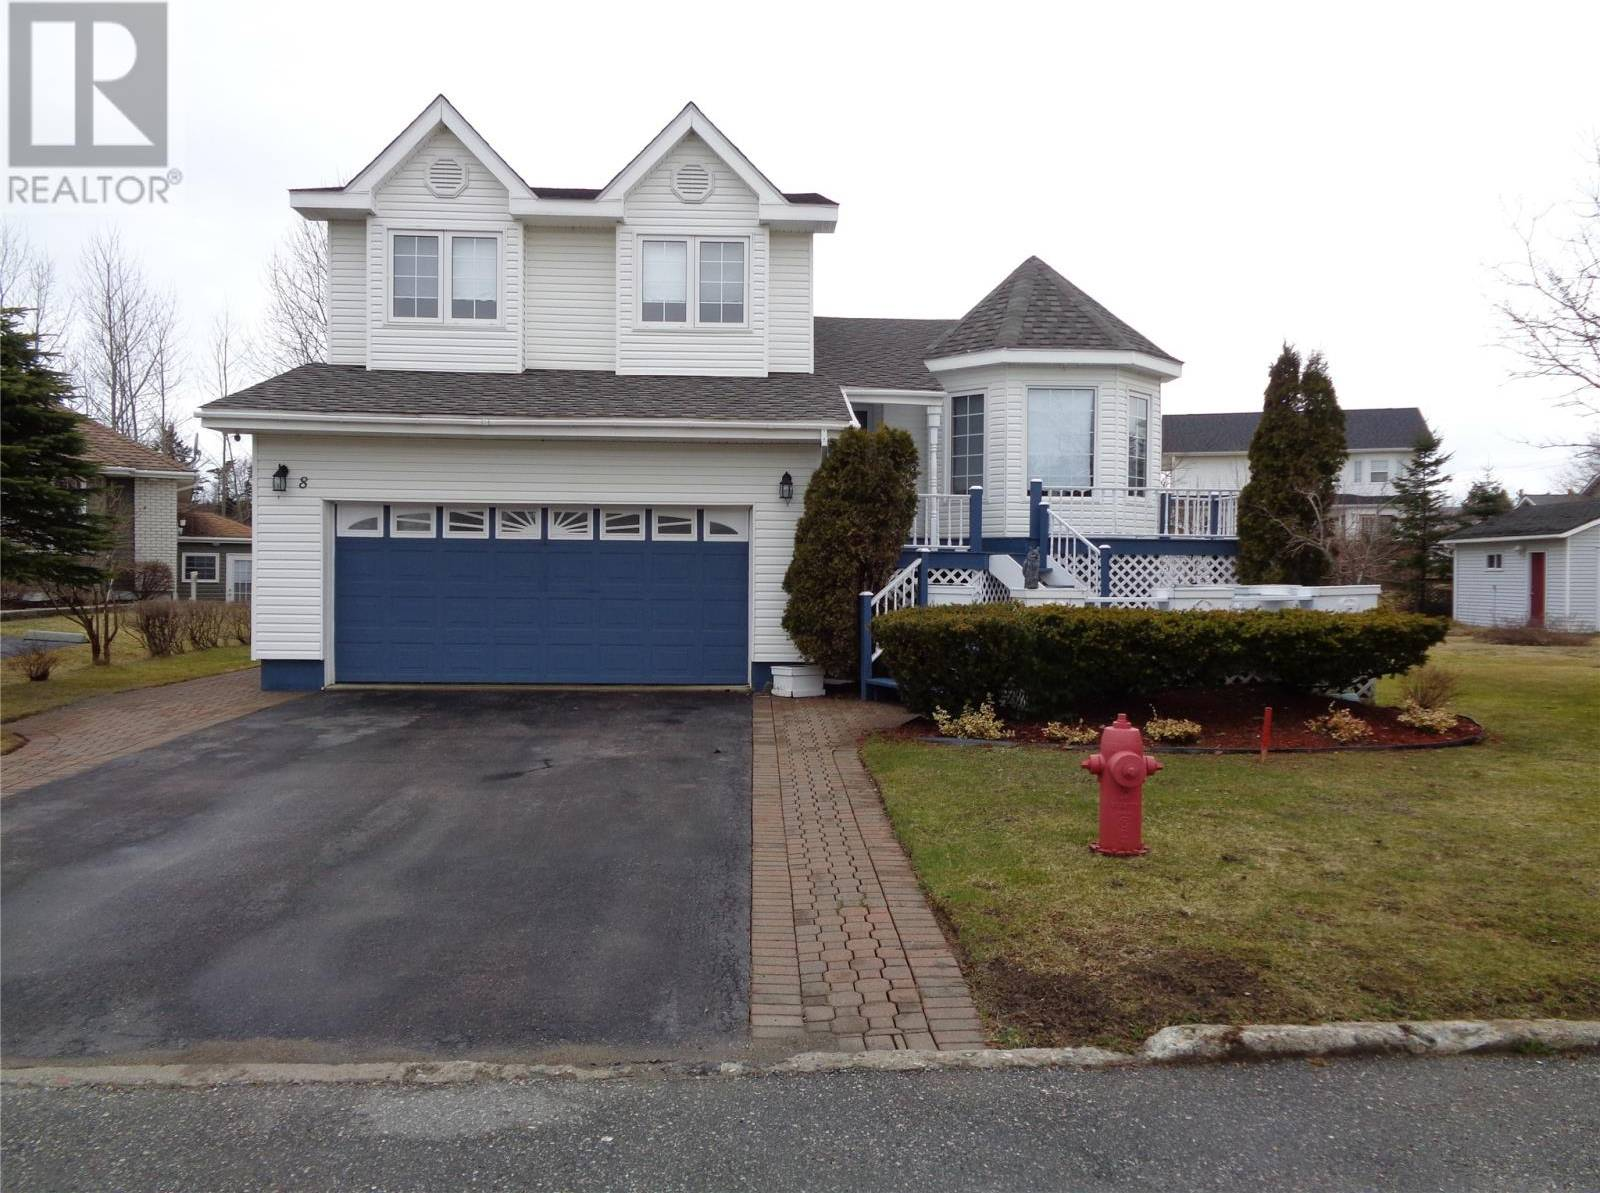 House for sale at 8 Shave Pl Stephenville Newfoundland - MLS: 1155729